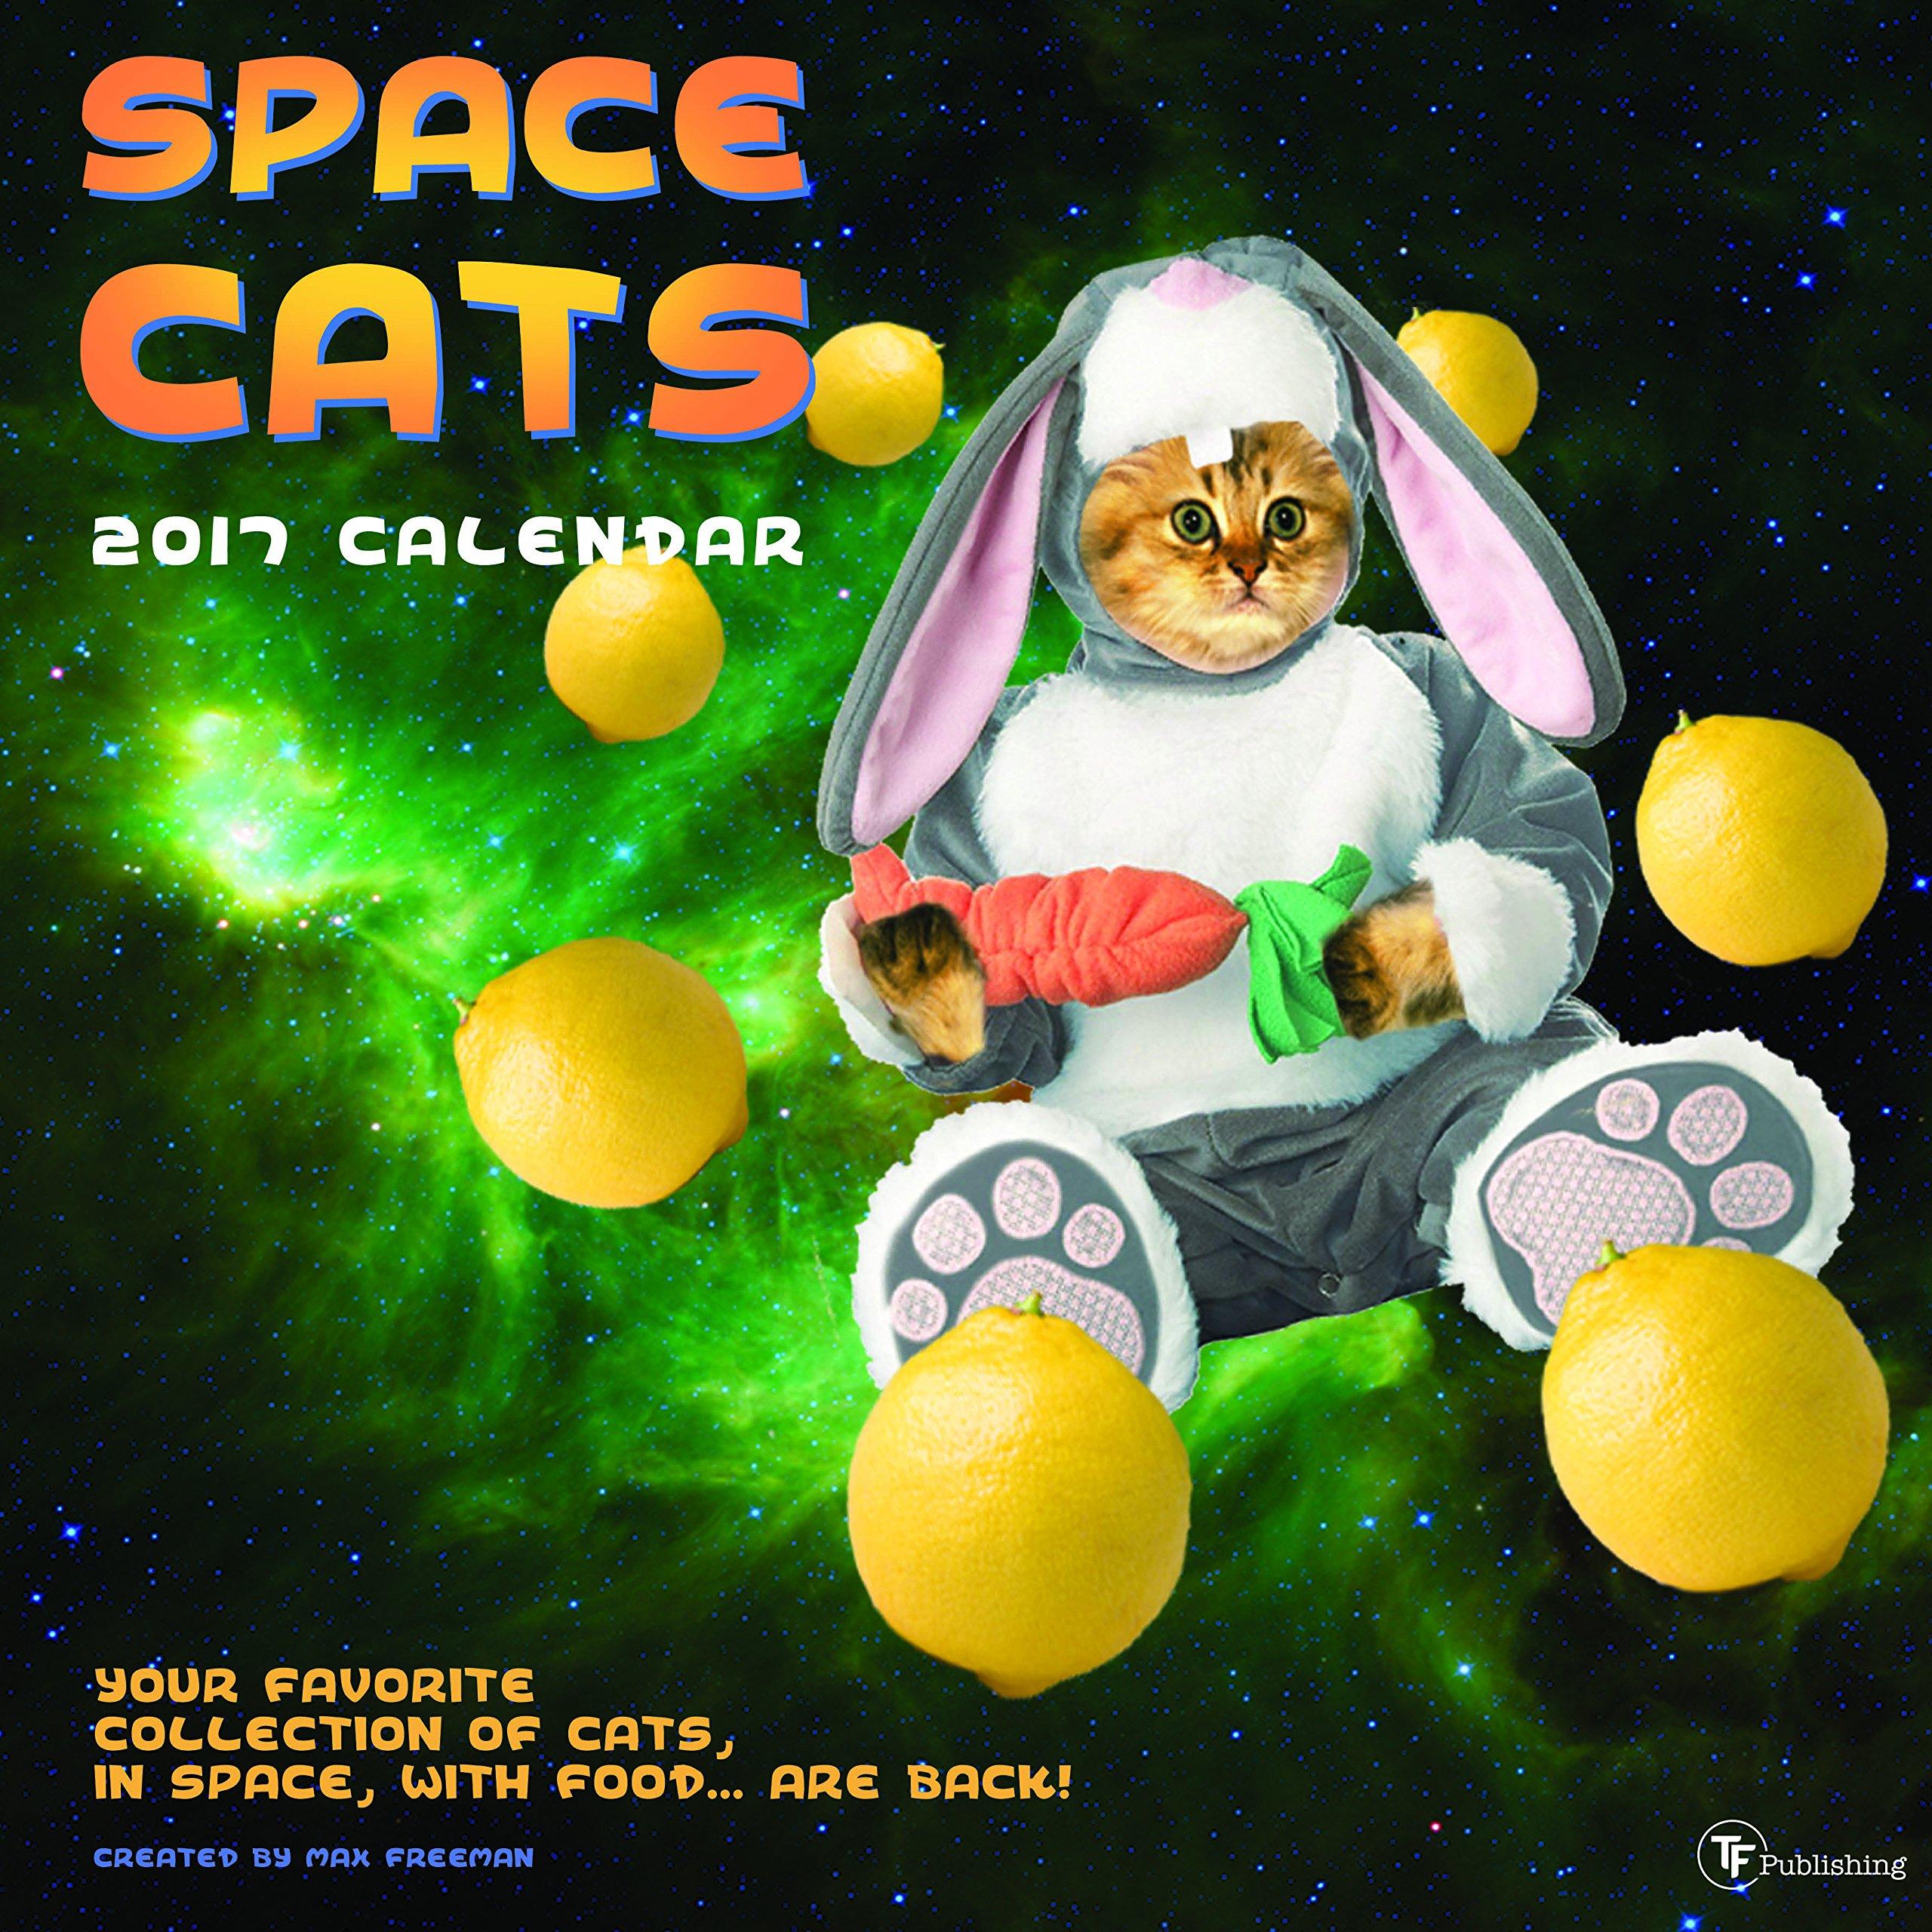 2017 Space Cats Wall Calendar TF Publishing 9781624387333